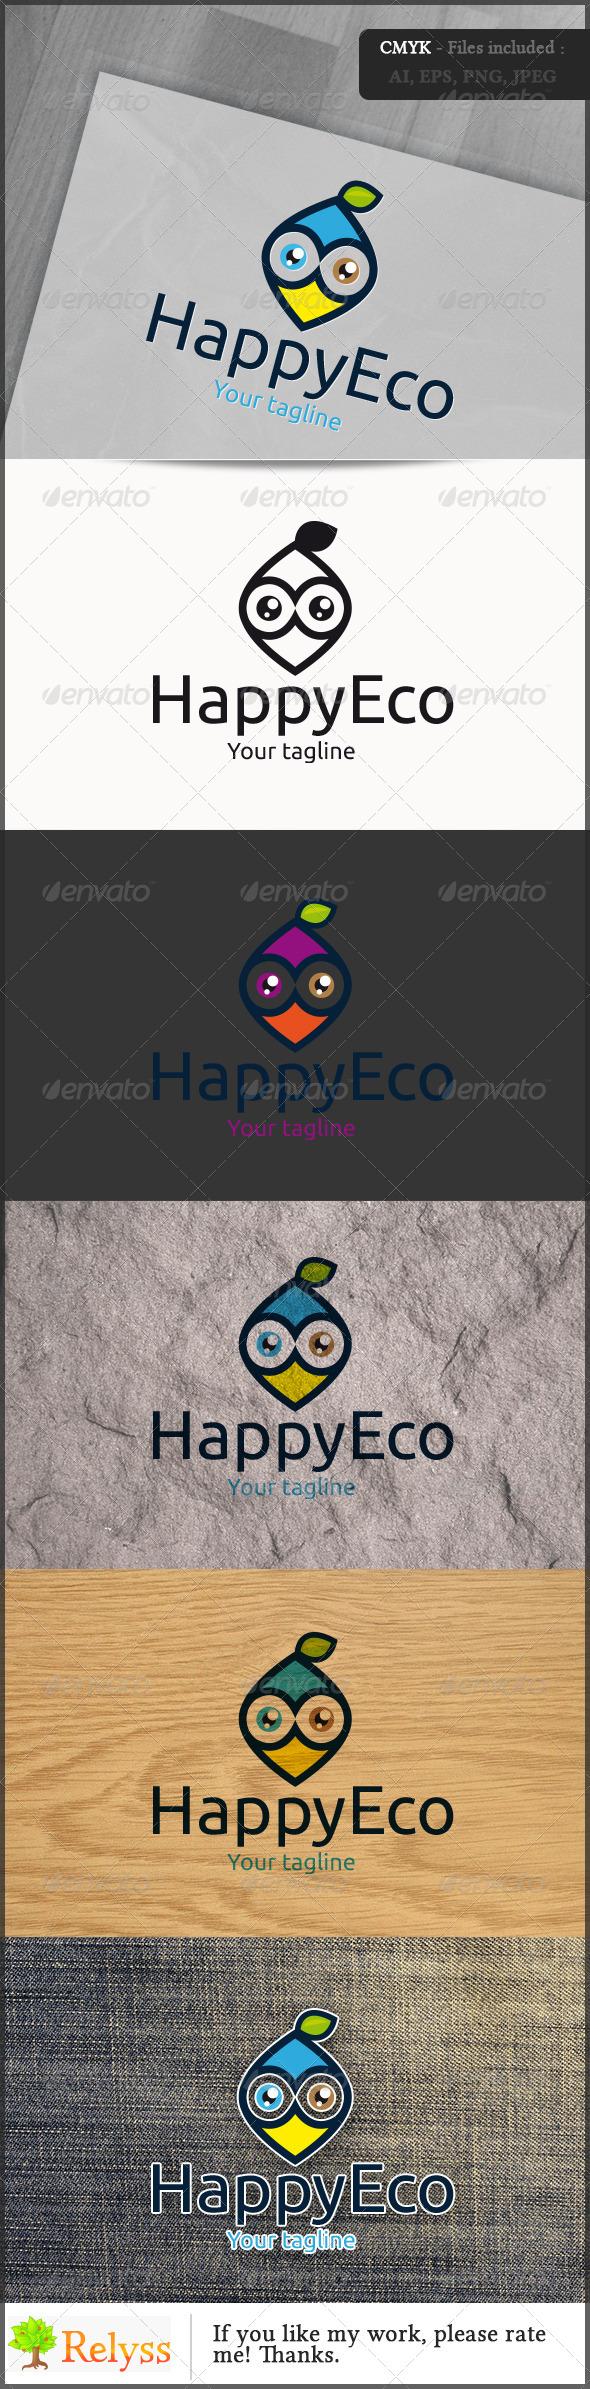 GraphicRiver HappyEco 7272571